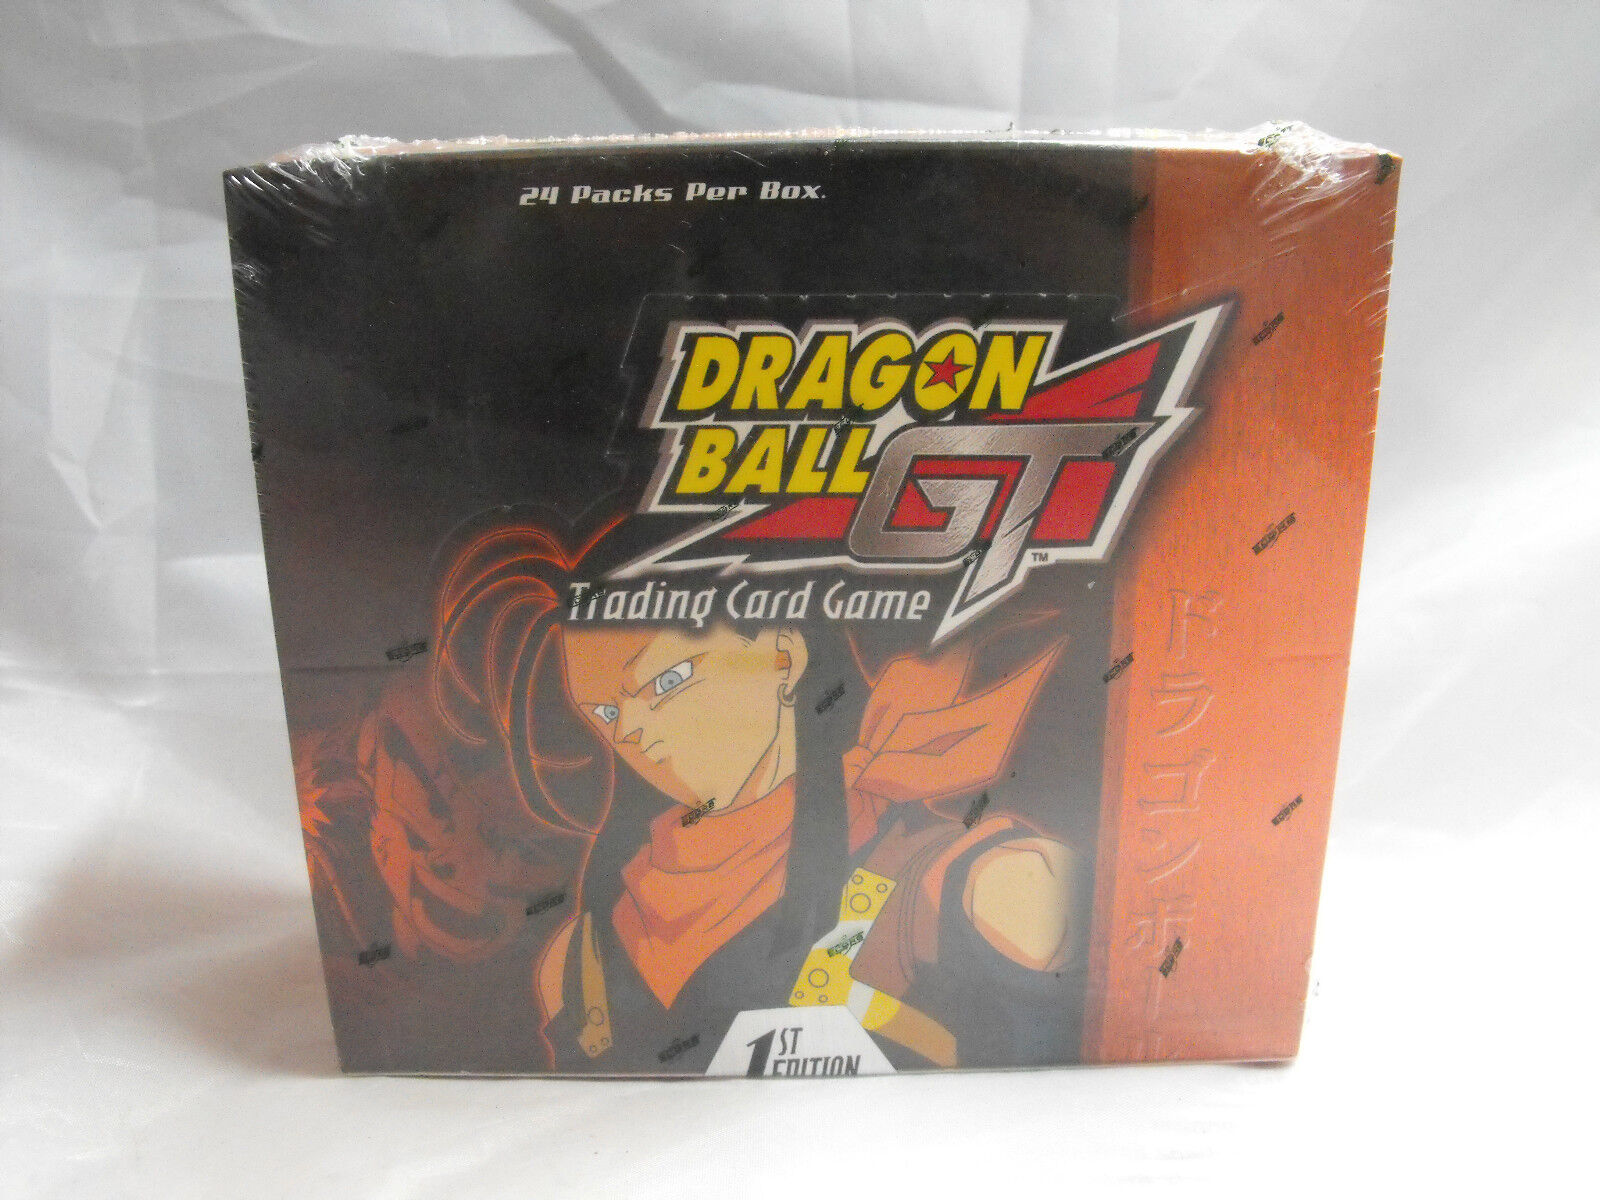 Dragon ball gt tcg ist ú je 17 - saga sellado booster caja de paquetes 24 (1.